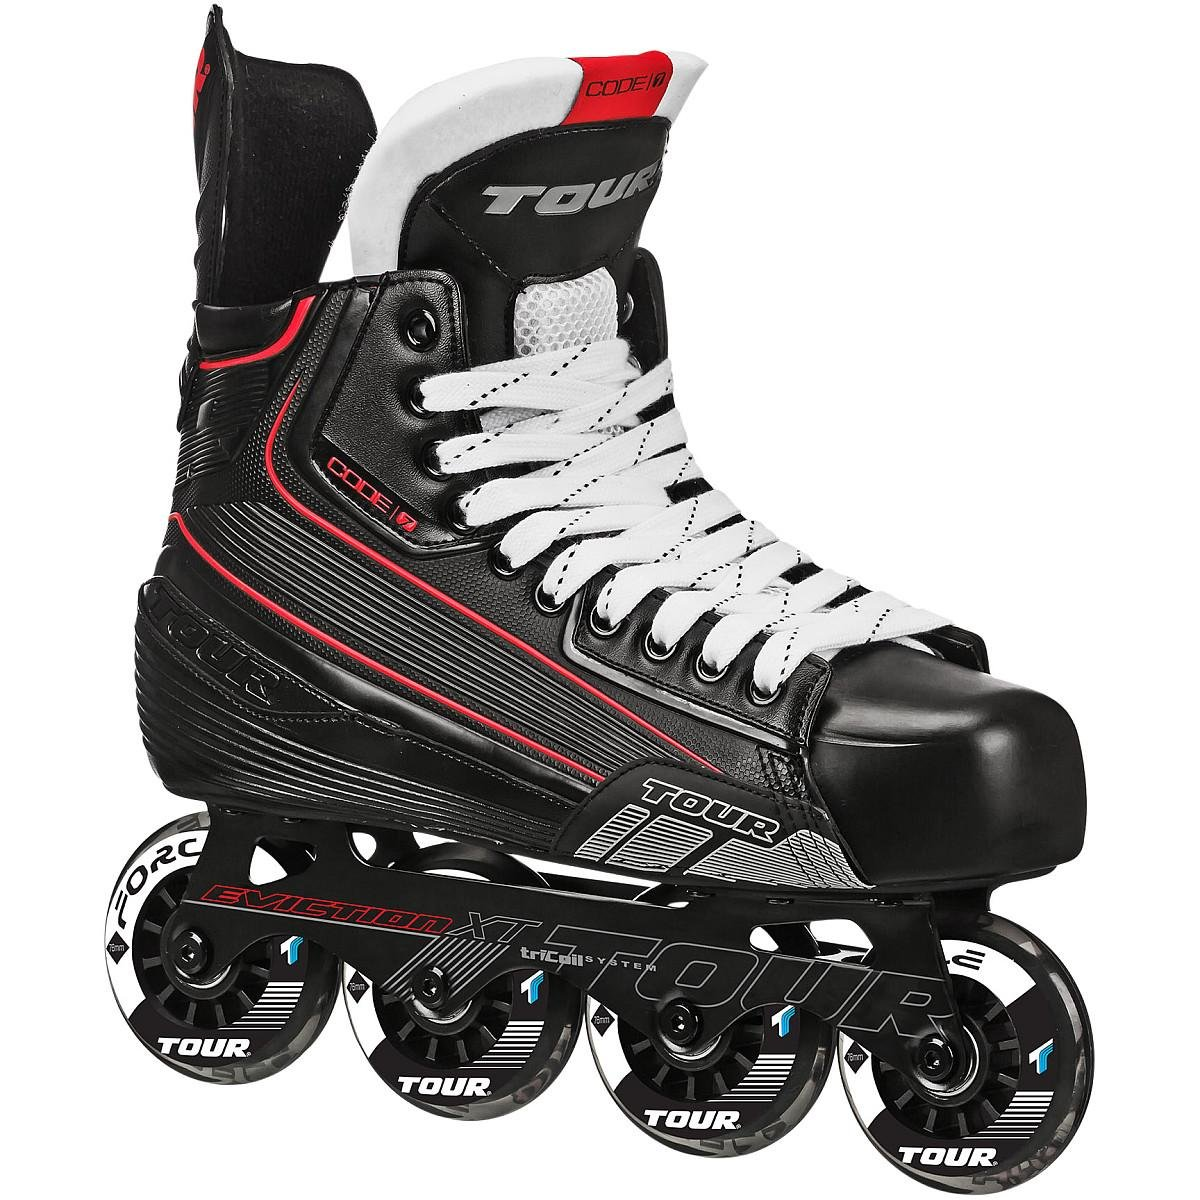 Tour Hockey Code 7 Senior Inline Hockey Skate, Black, 06